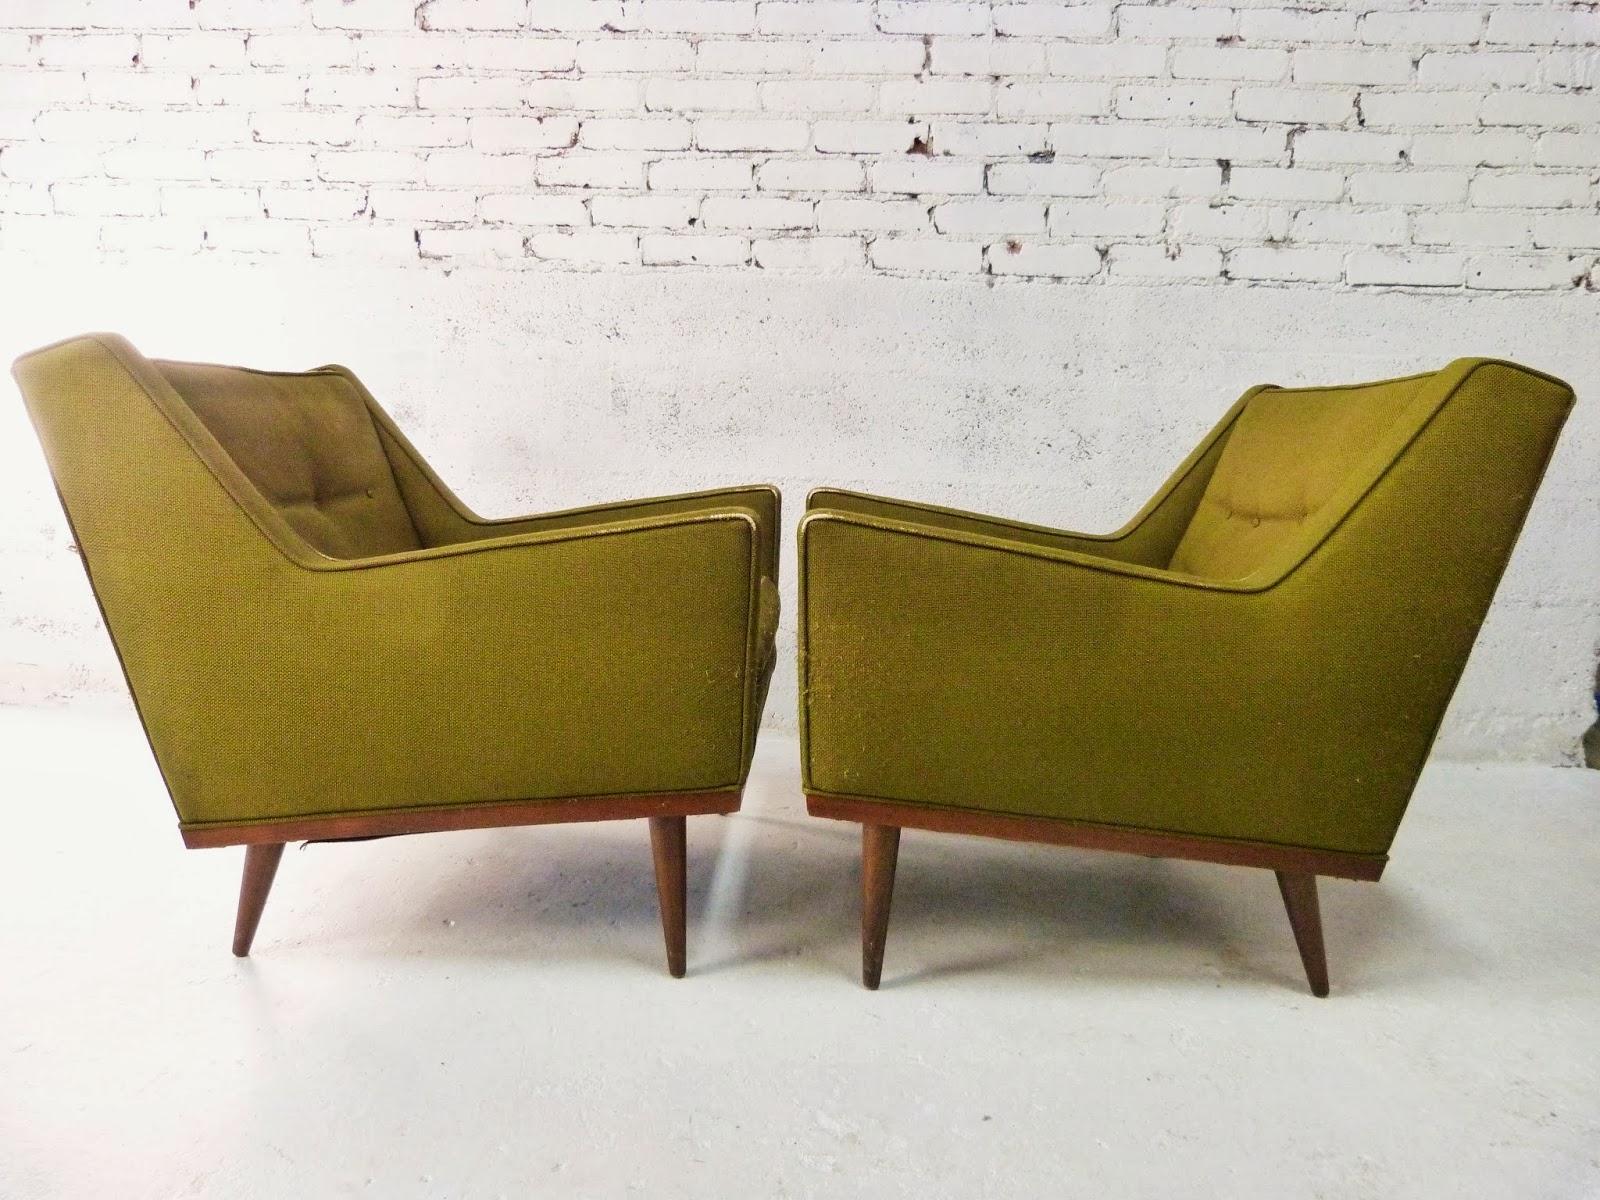 The Anatomy Of Refurbished Mid Century Furniture Design